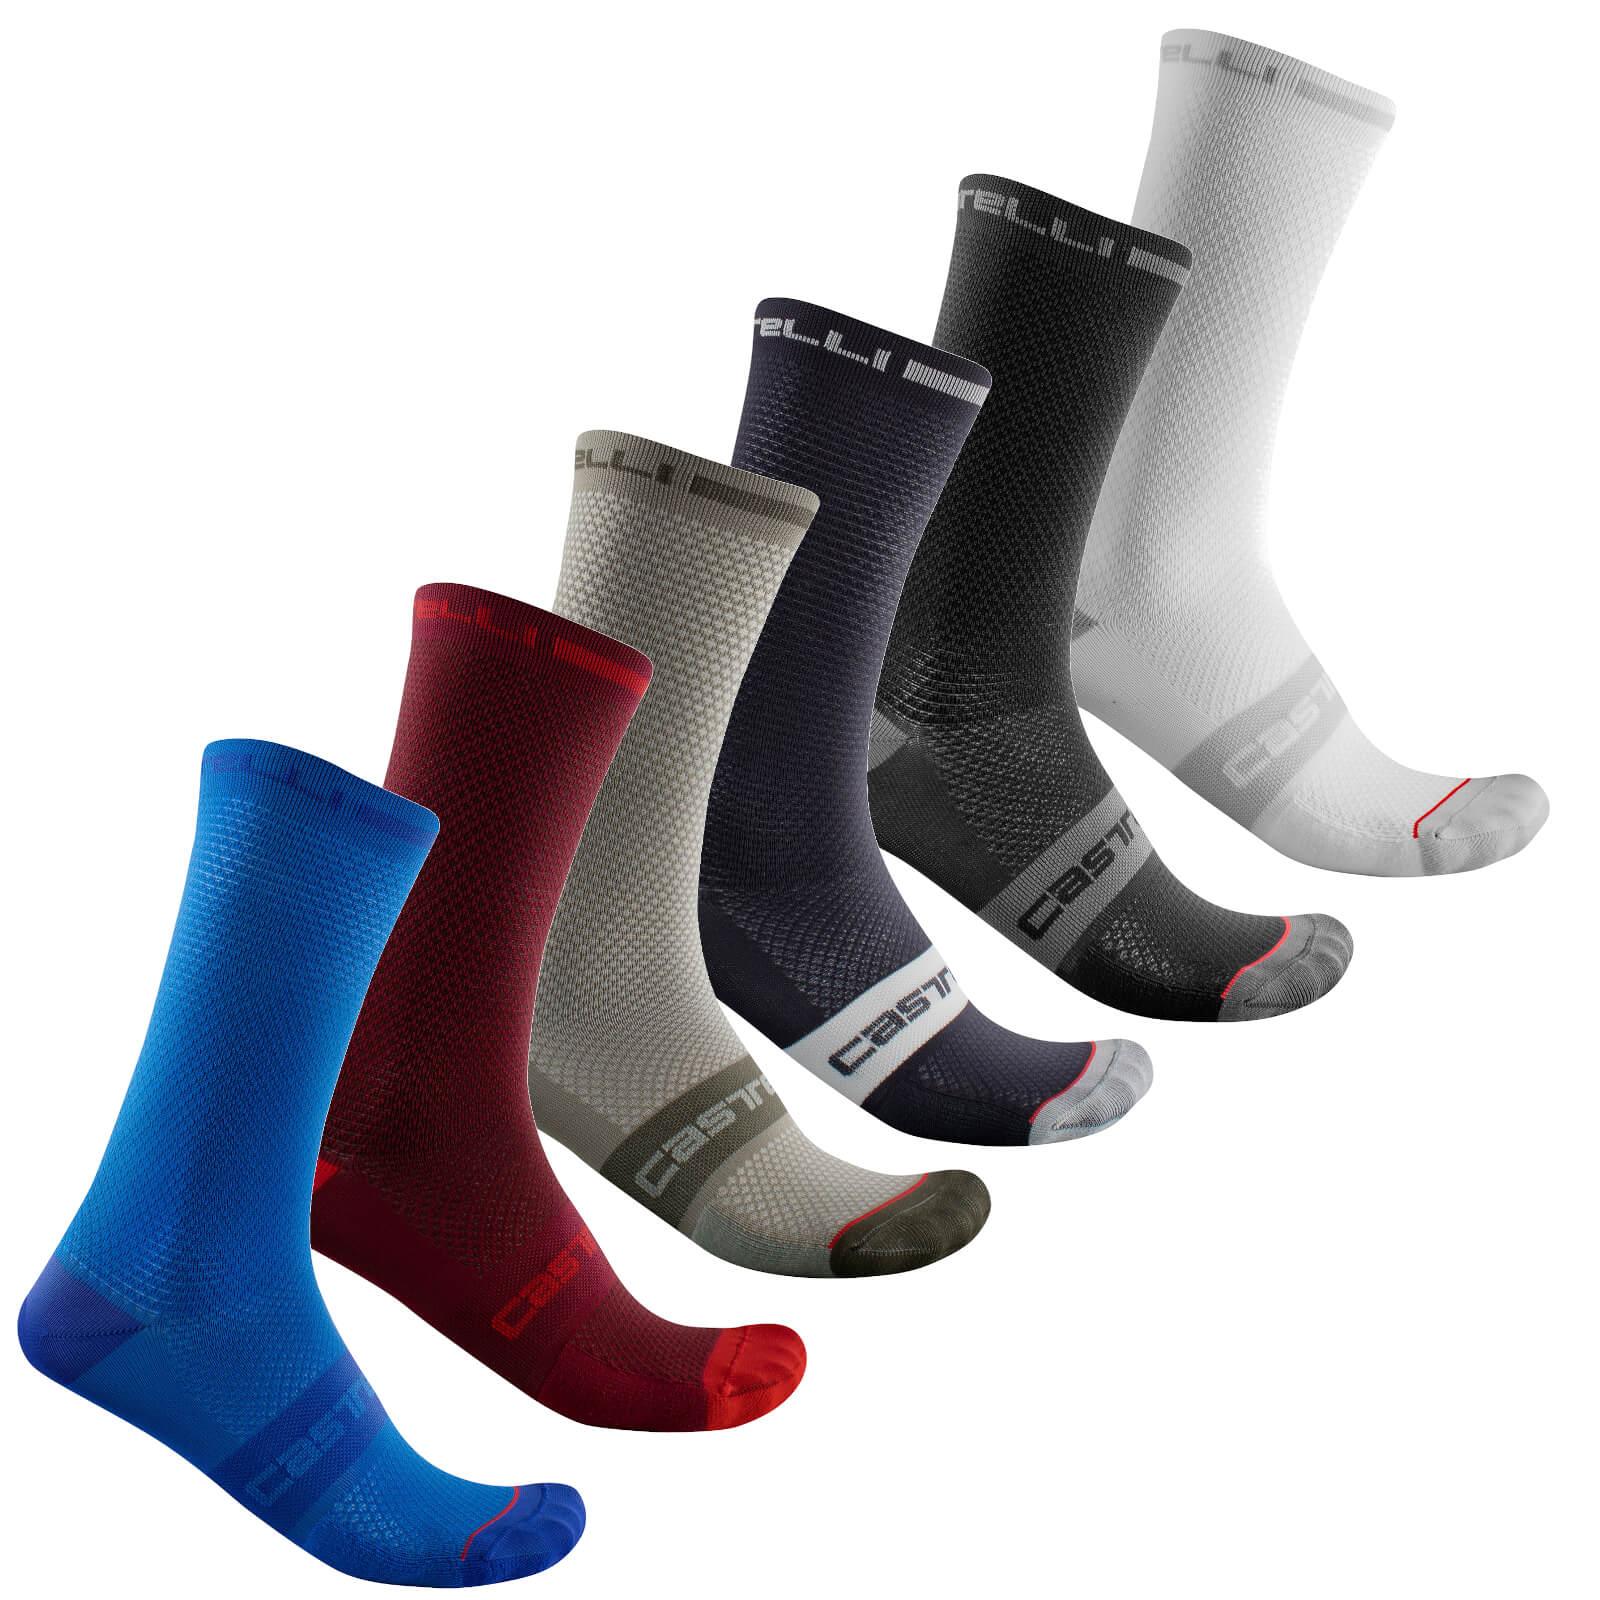 Castelli Superleggera T 18 Socks - L/XL - Schwarz